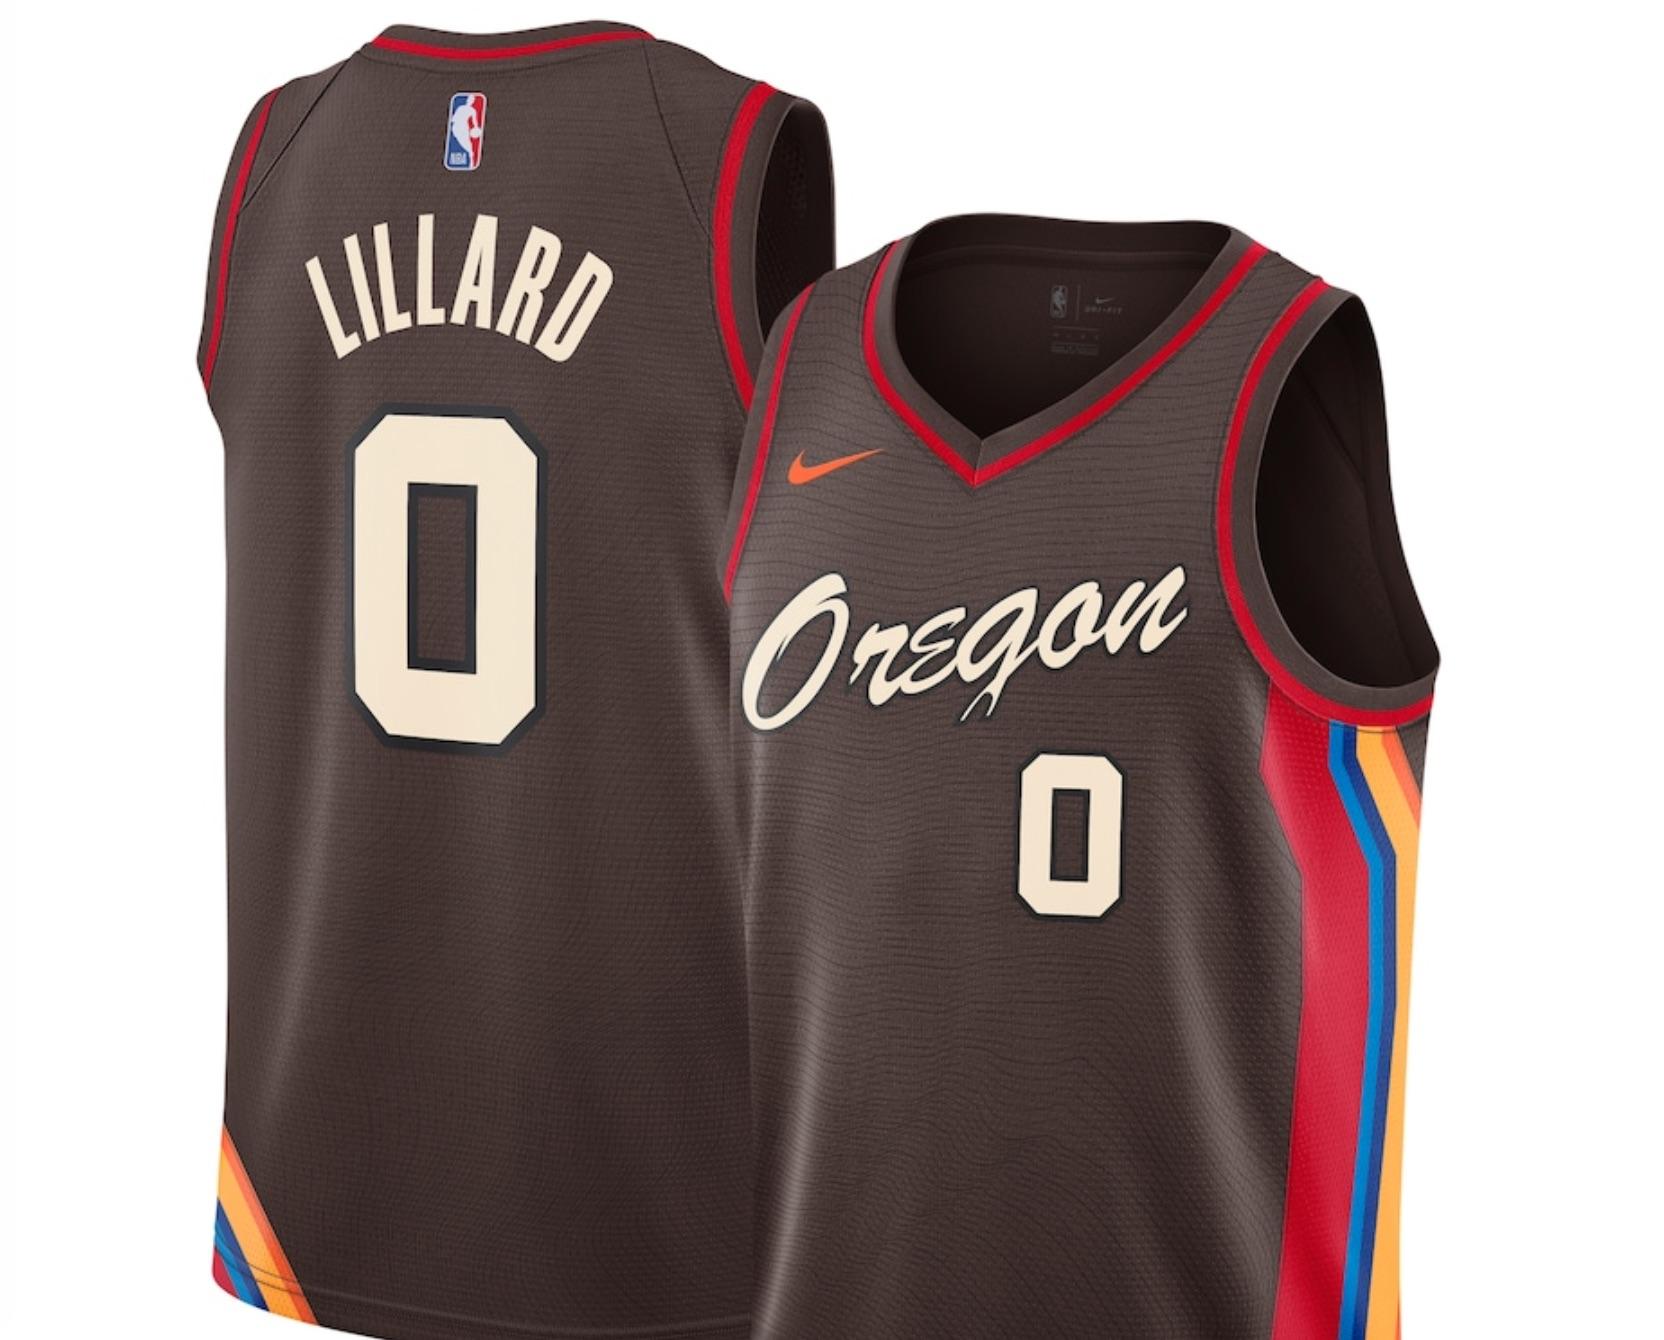 Portland Trail Blazers City Edition jerseys on sale: Where to buy ...